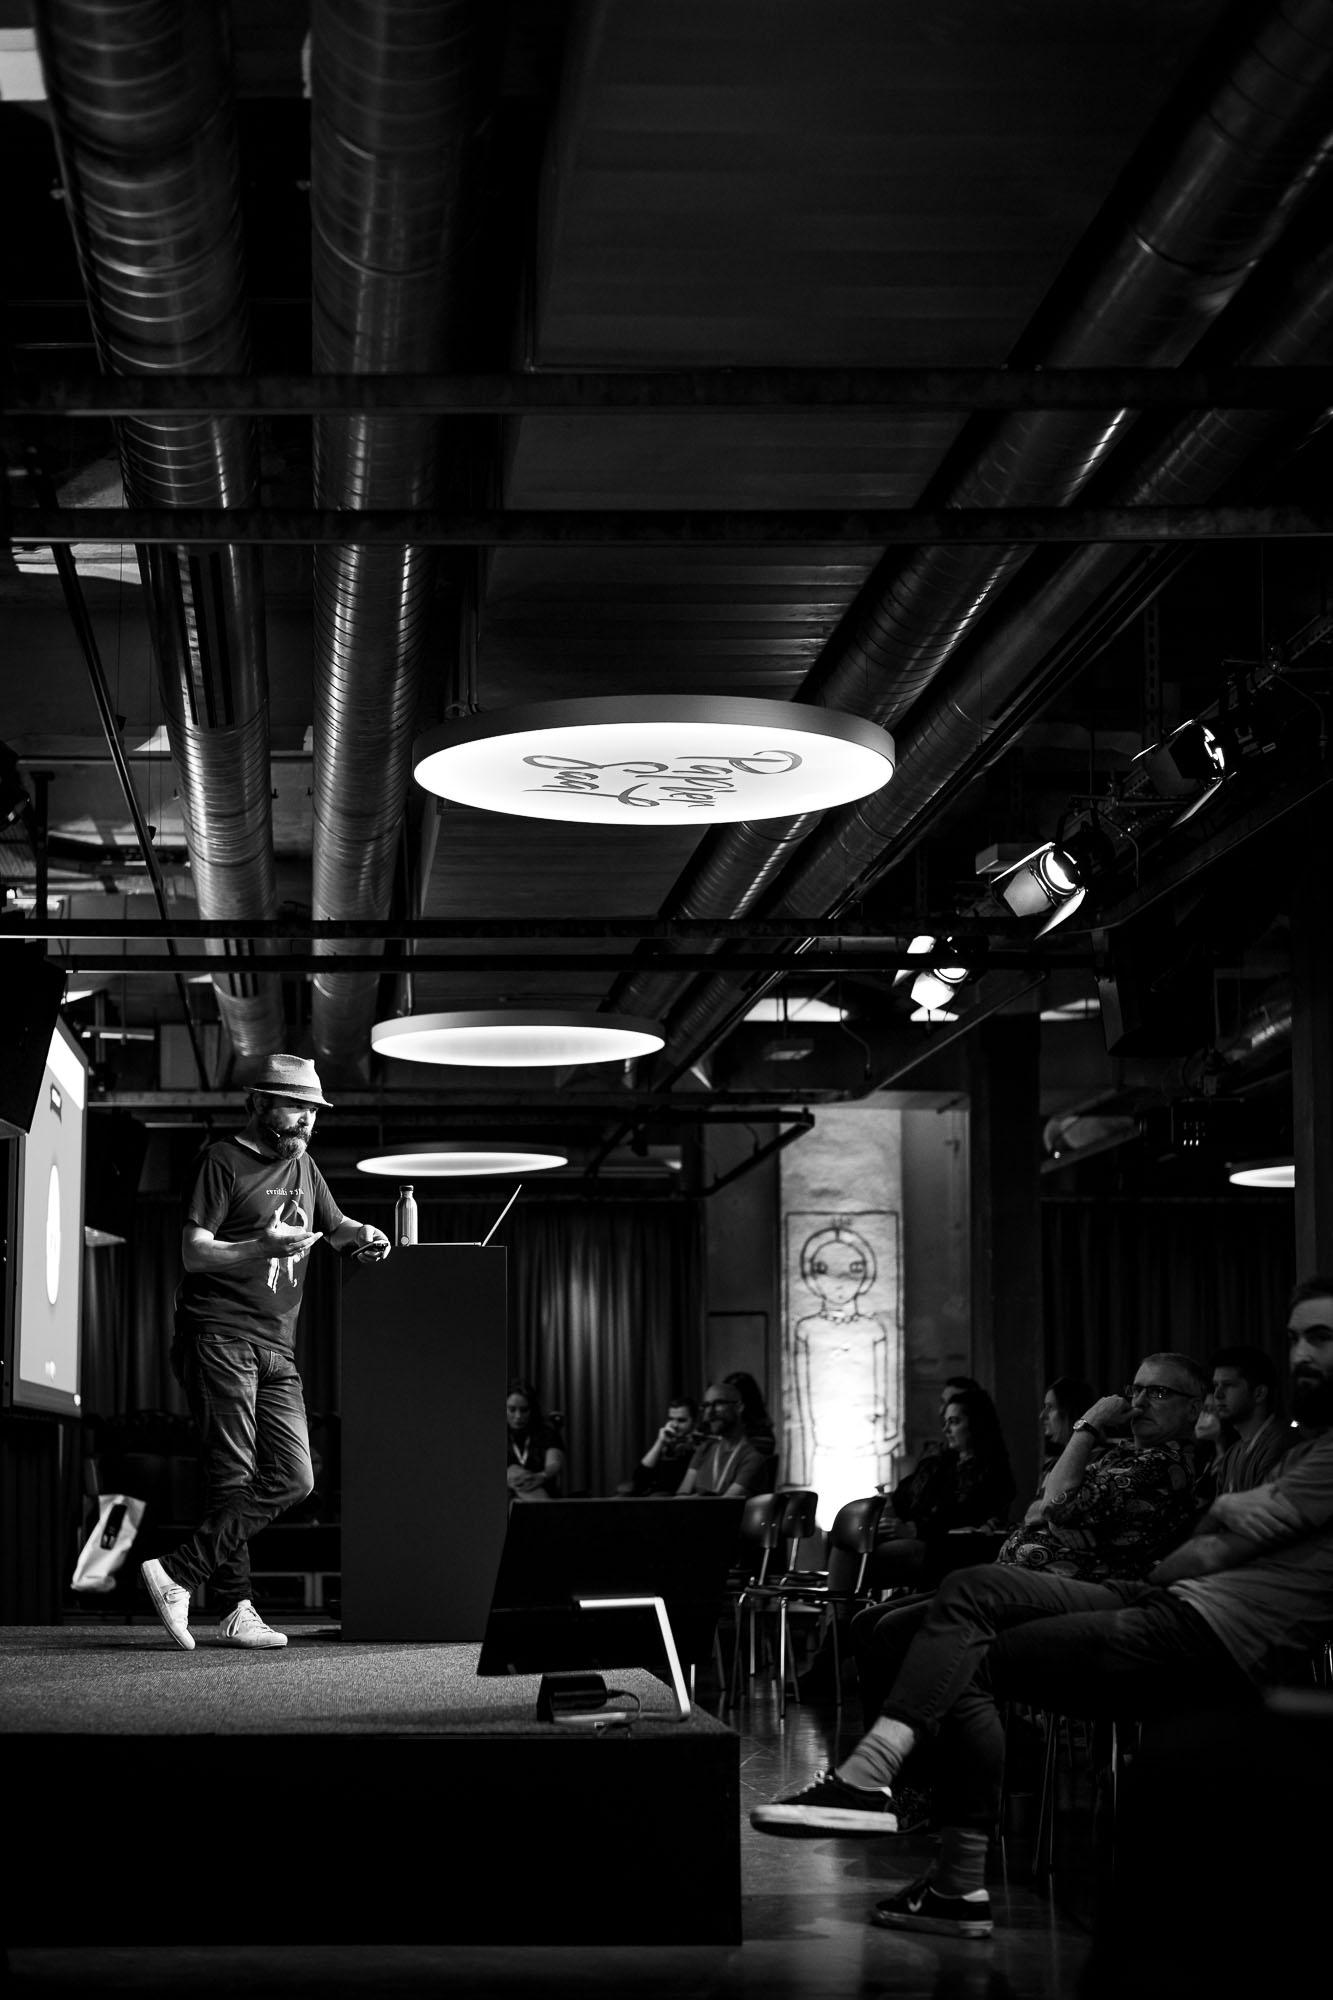 Vasilis van Gemert on stage at Front Conference 2021